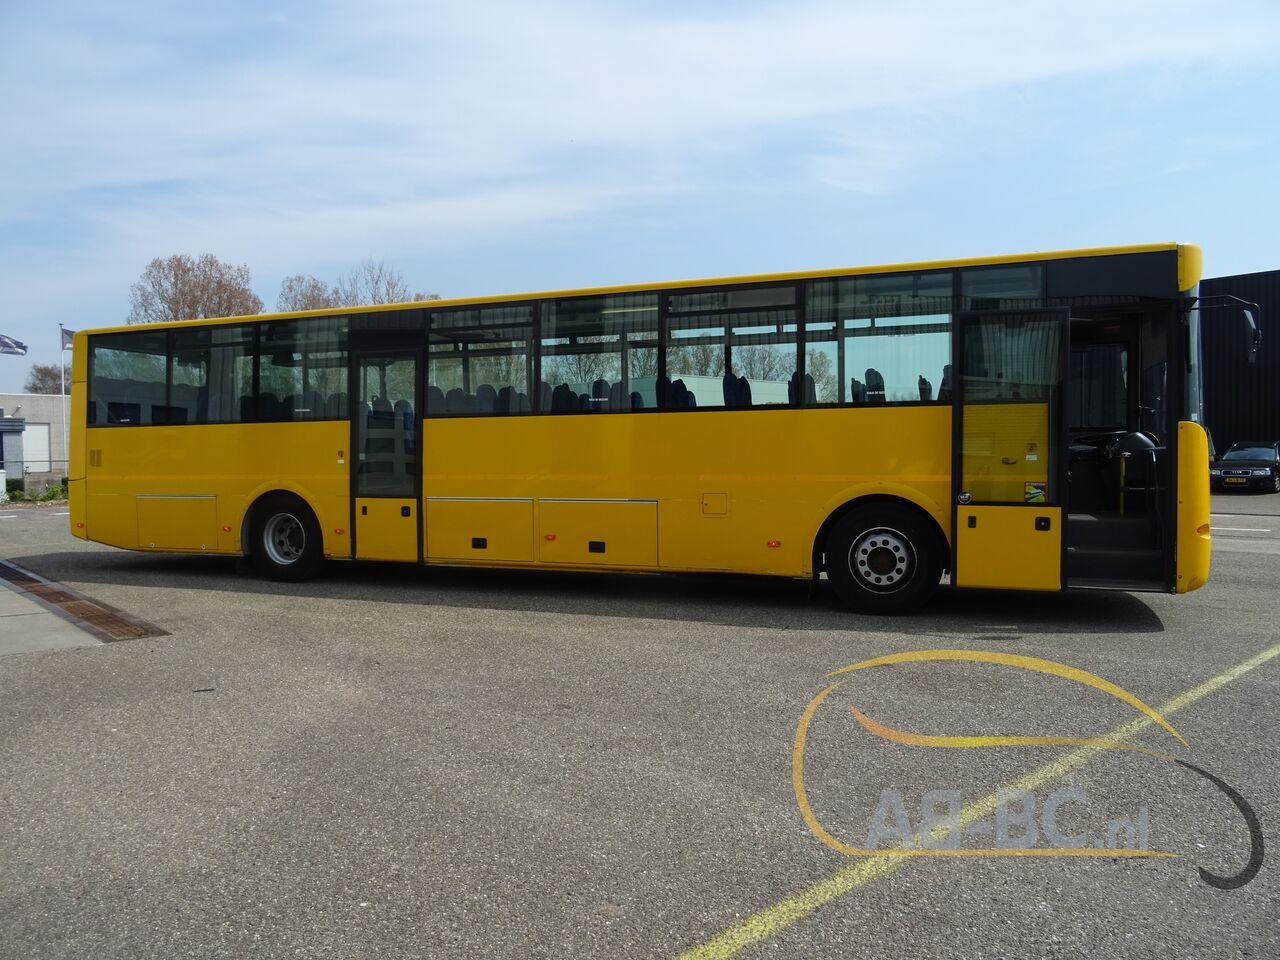 interurban-busMAN-Fast-64-seats---1619619638744699290_big_85f8548caa64c9c147b40611eb63e2bf--21042817163019598600